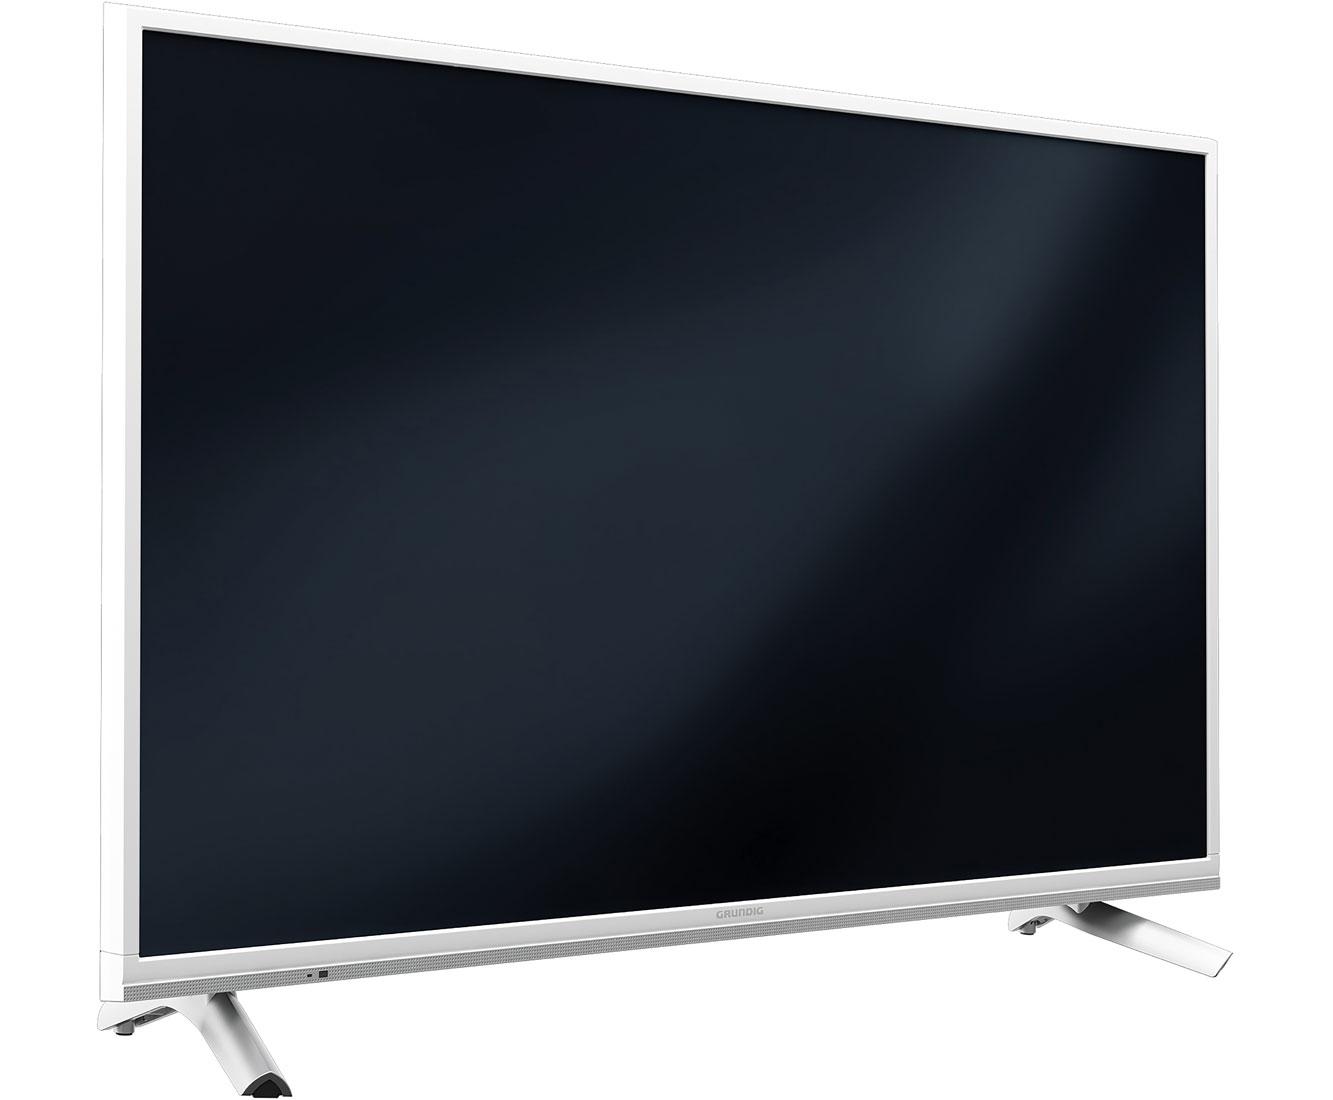 grundig 65 guw 8960 4k uhd led fernseher 164 cm 65 zoll hdr wei ebay. Black Bedroom Furniture Sets. Home Design Ideas